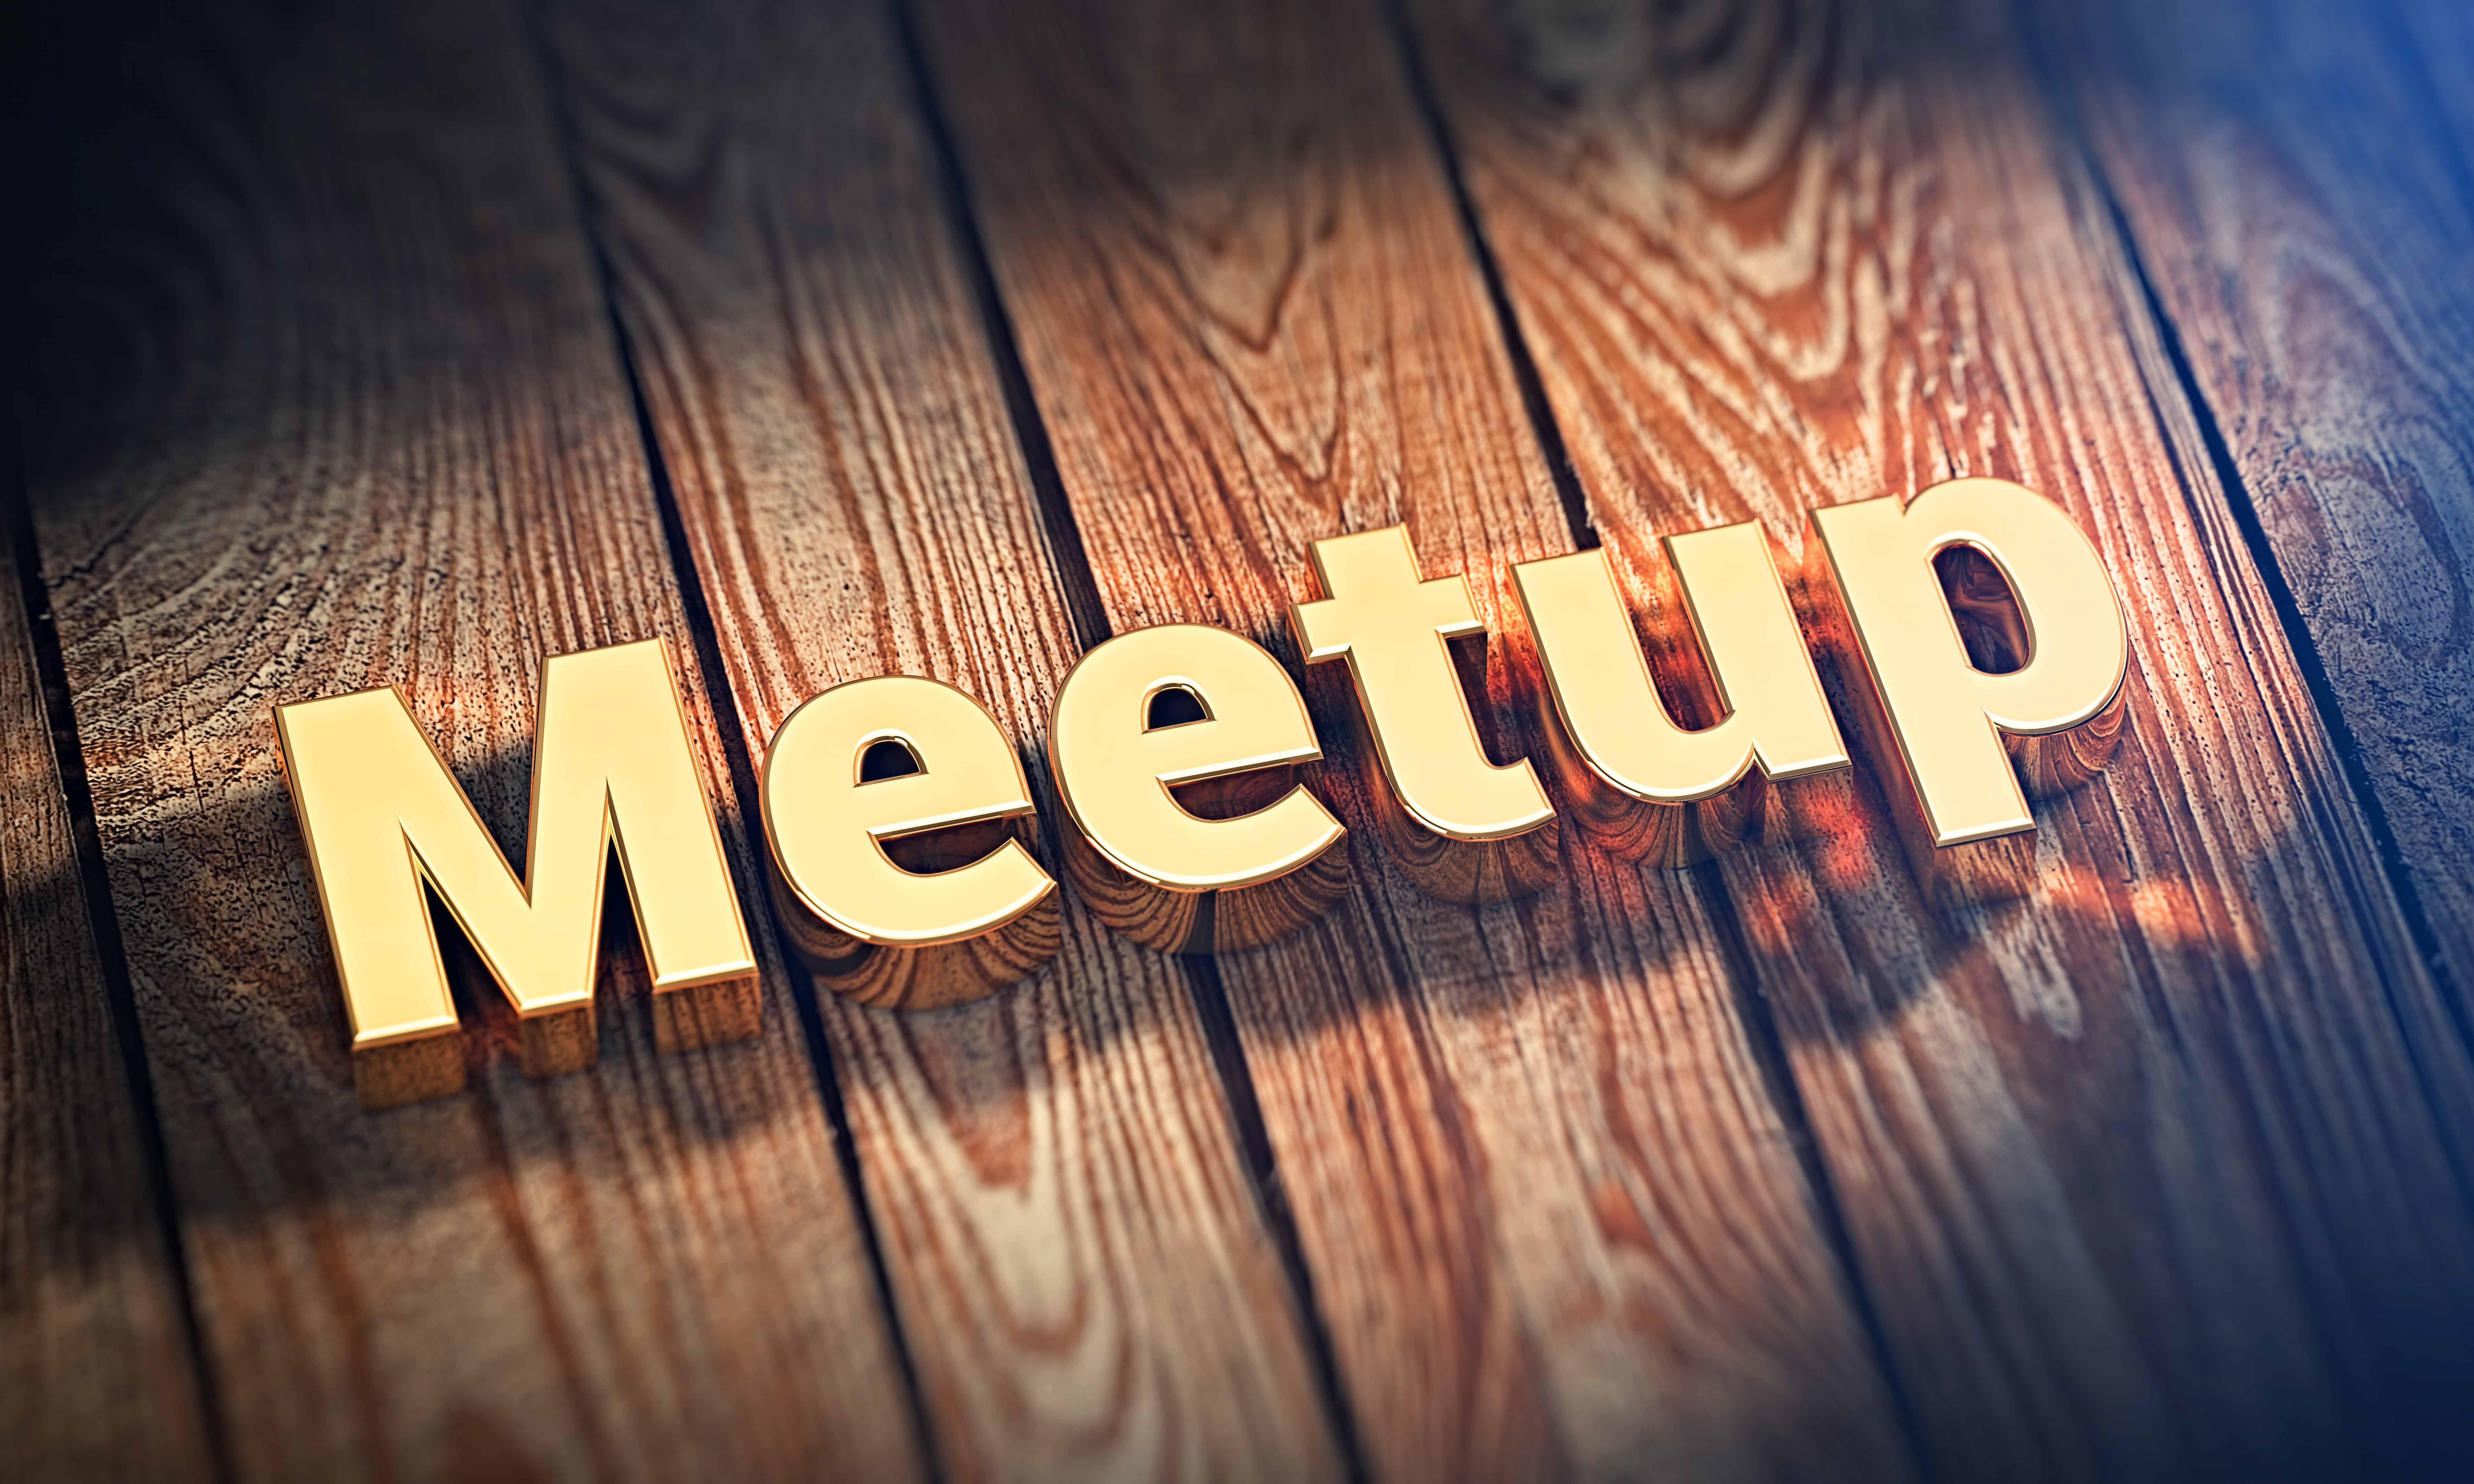 All about Laser Cutting: San Francisco & Paris Meetups